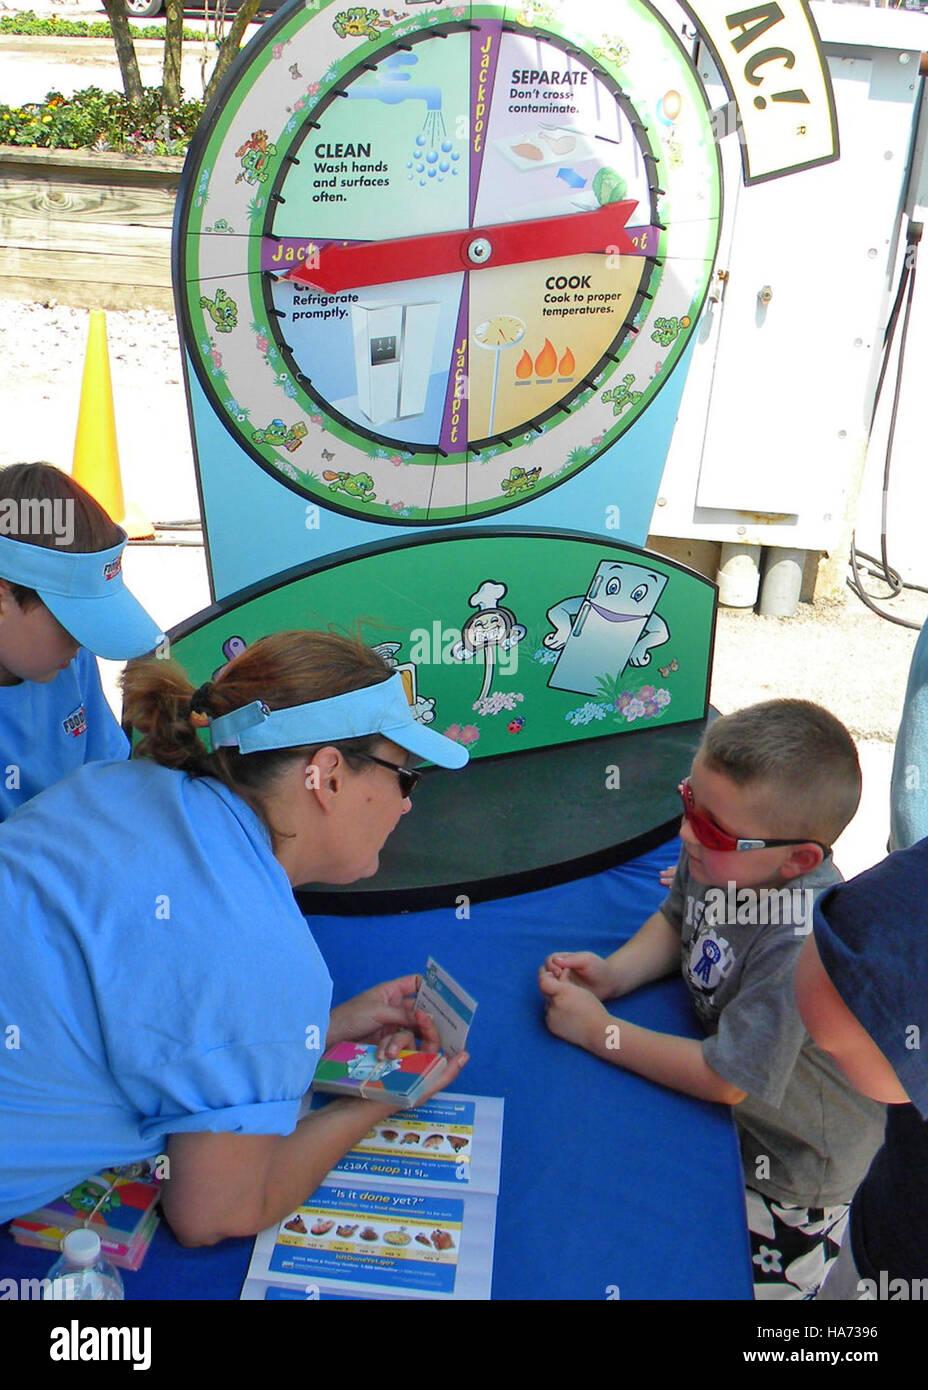 usdagov 5098953121 Illinois State Fair DSCN 1281 - Stock Image